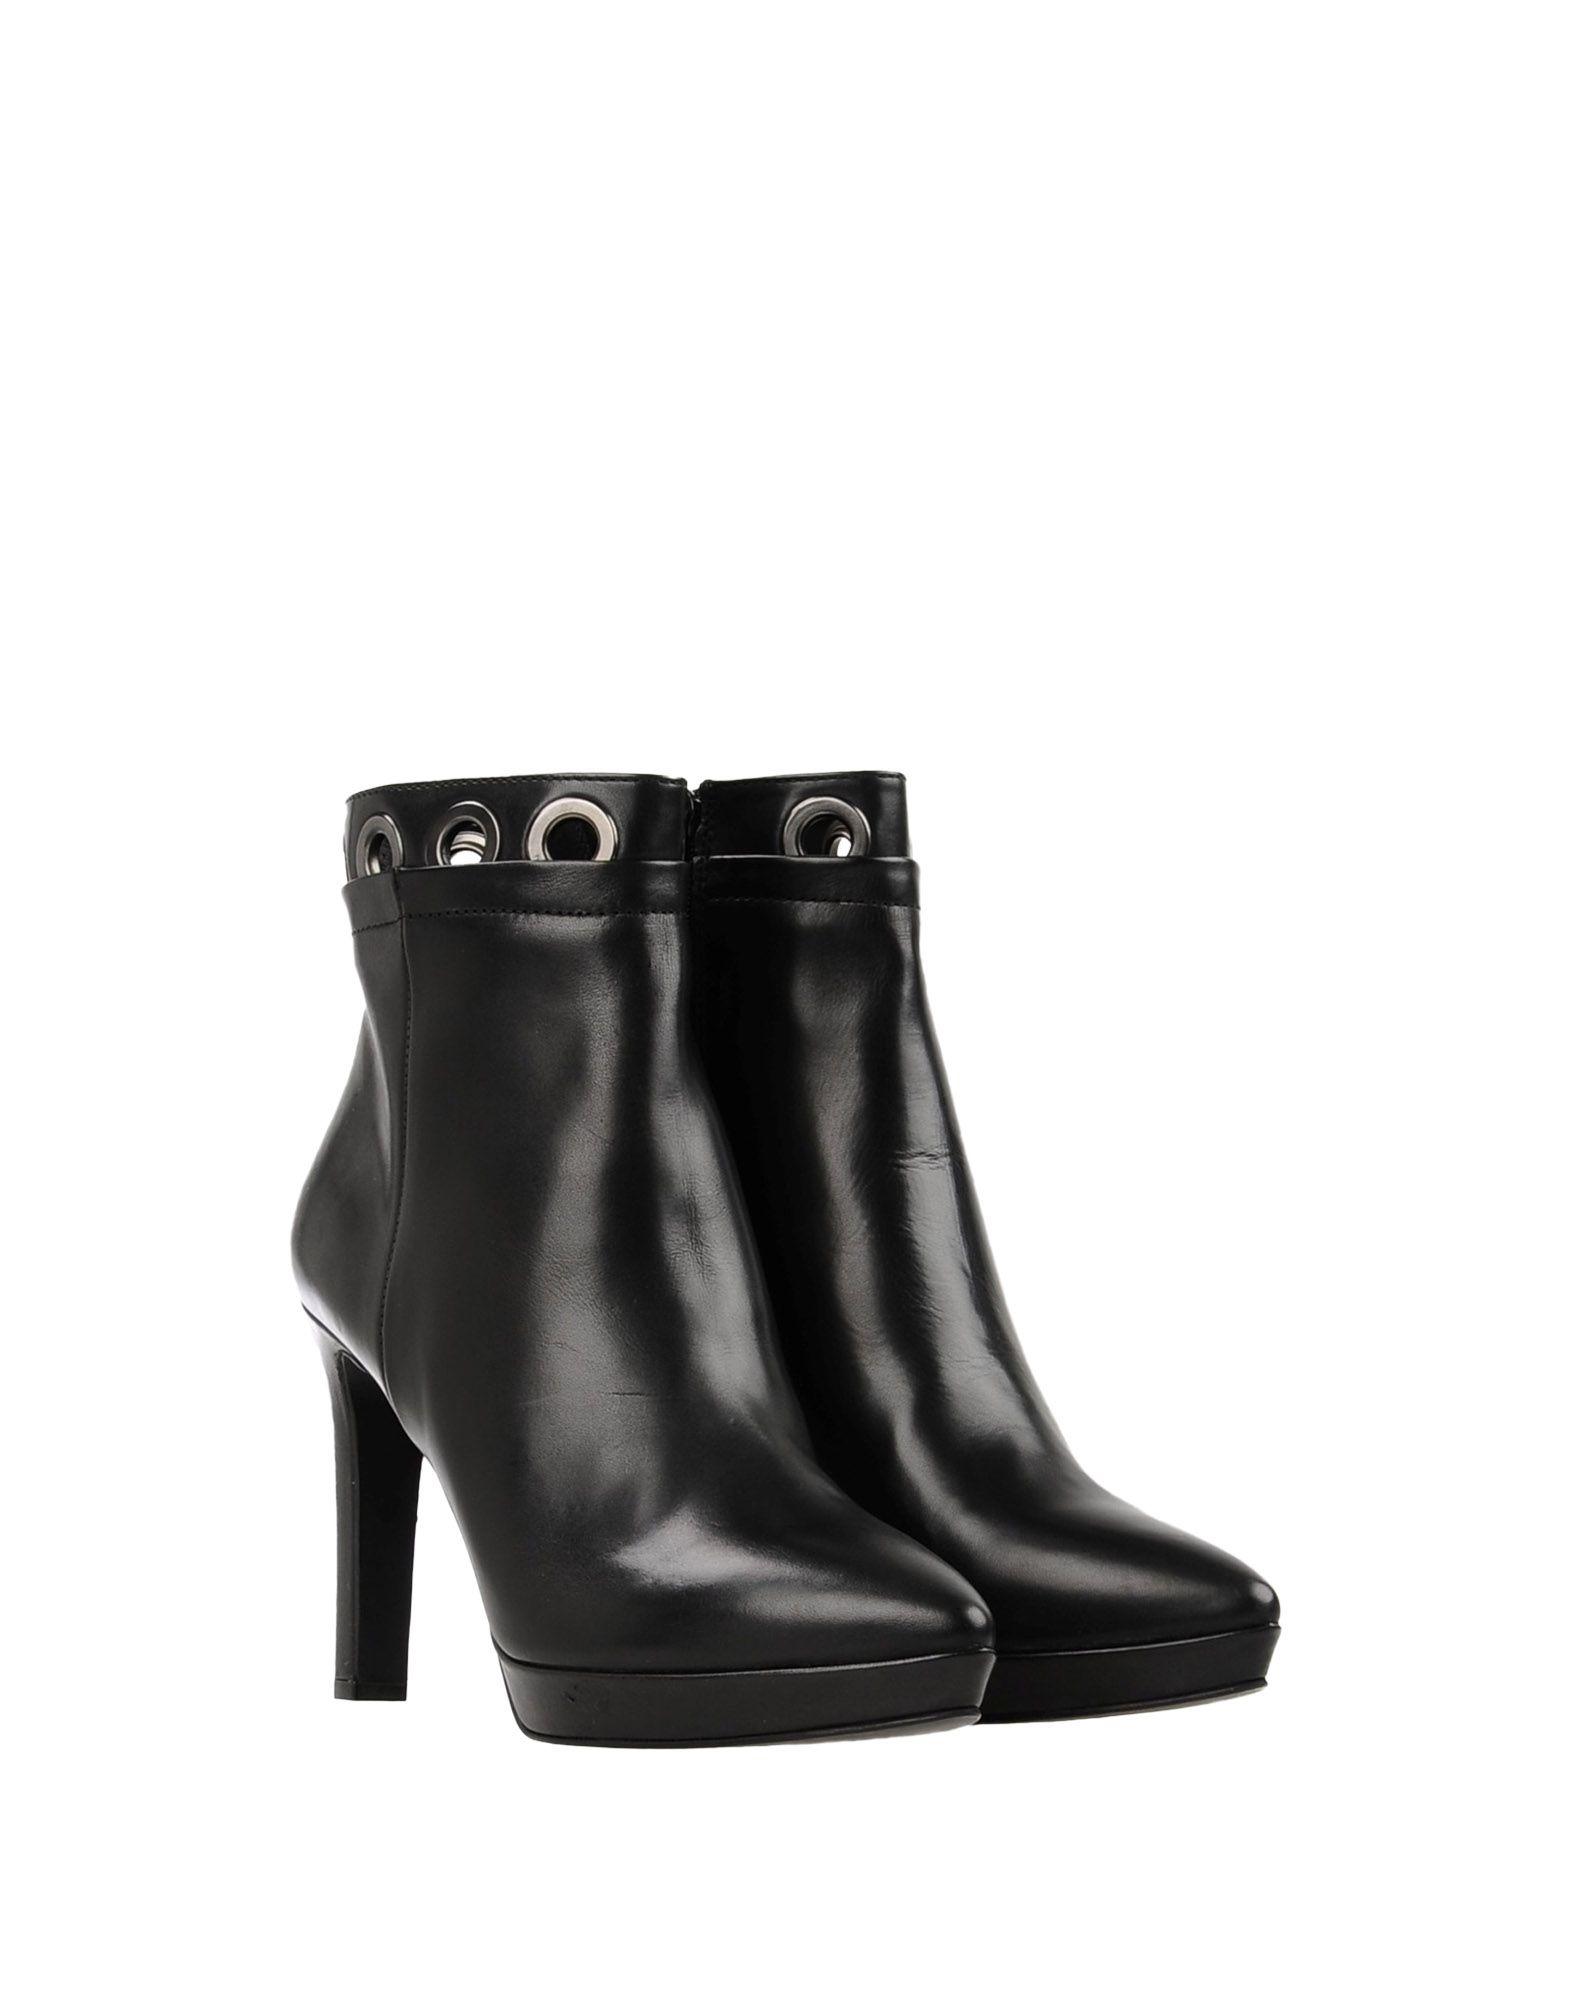 Dénouée Stiefelette Damen  11337740OE Gute Qualität beliebte Schuhe